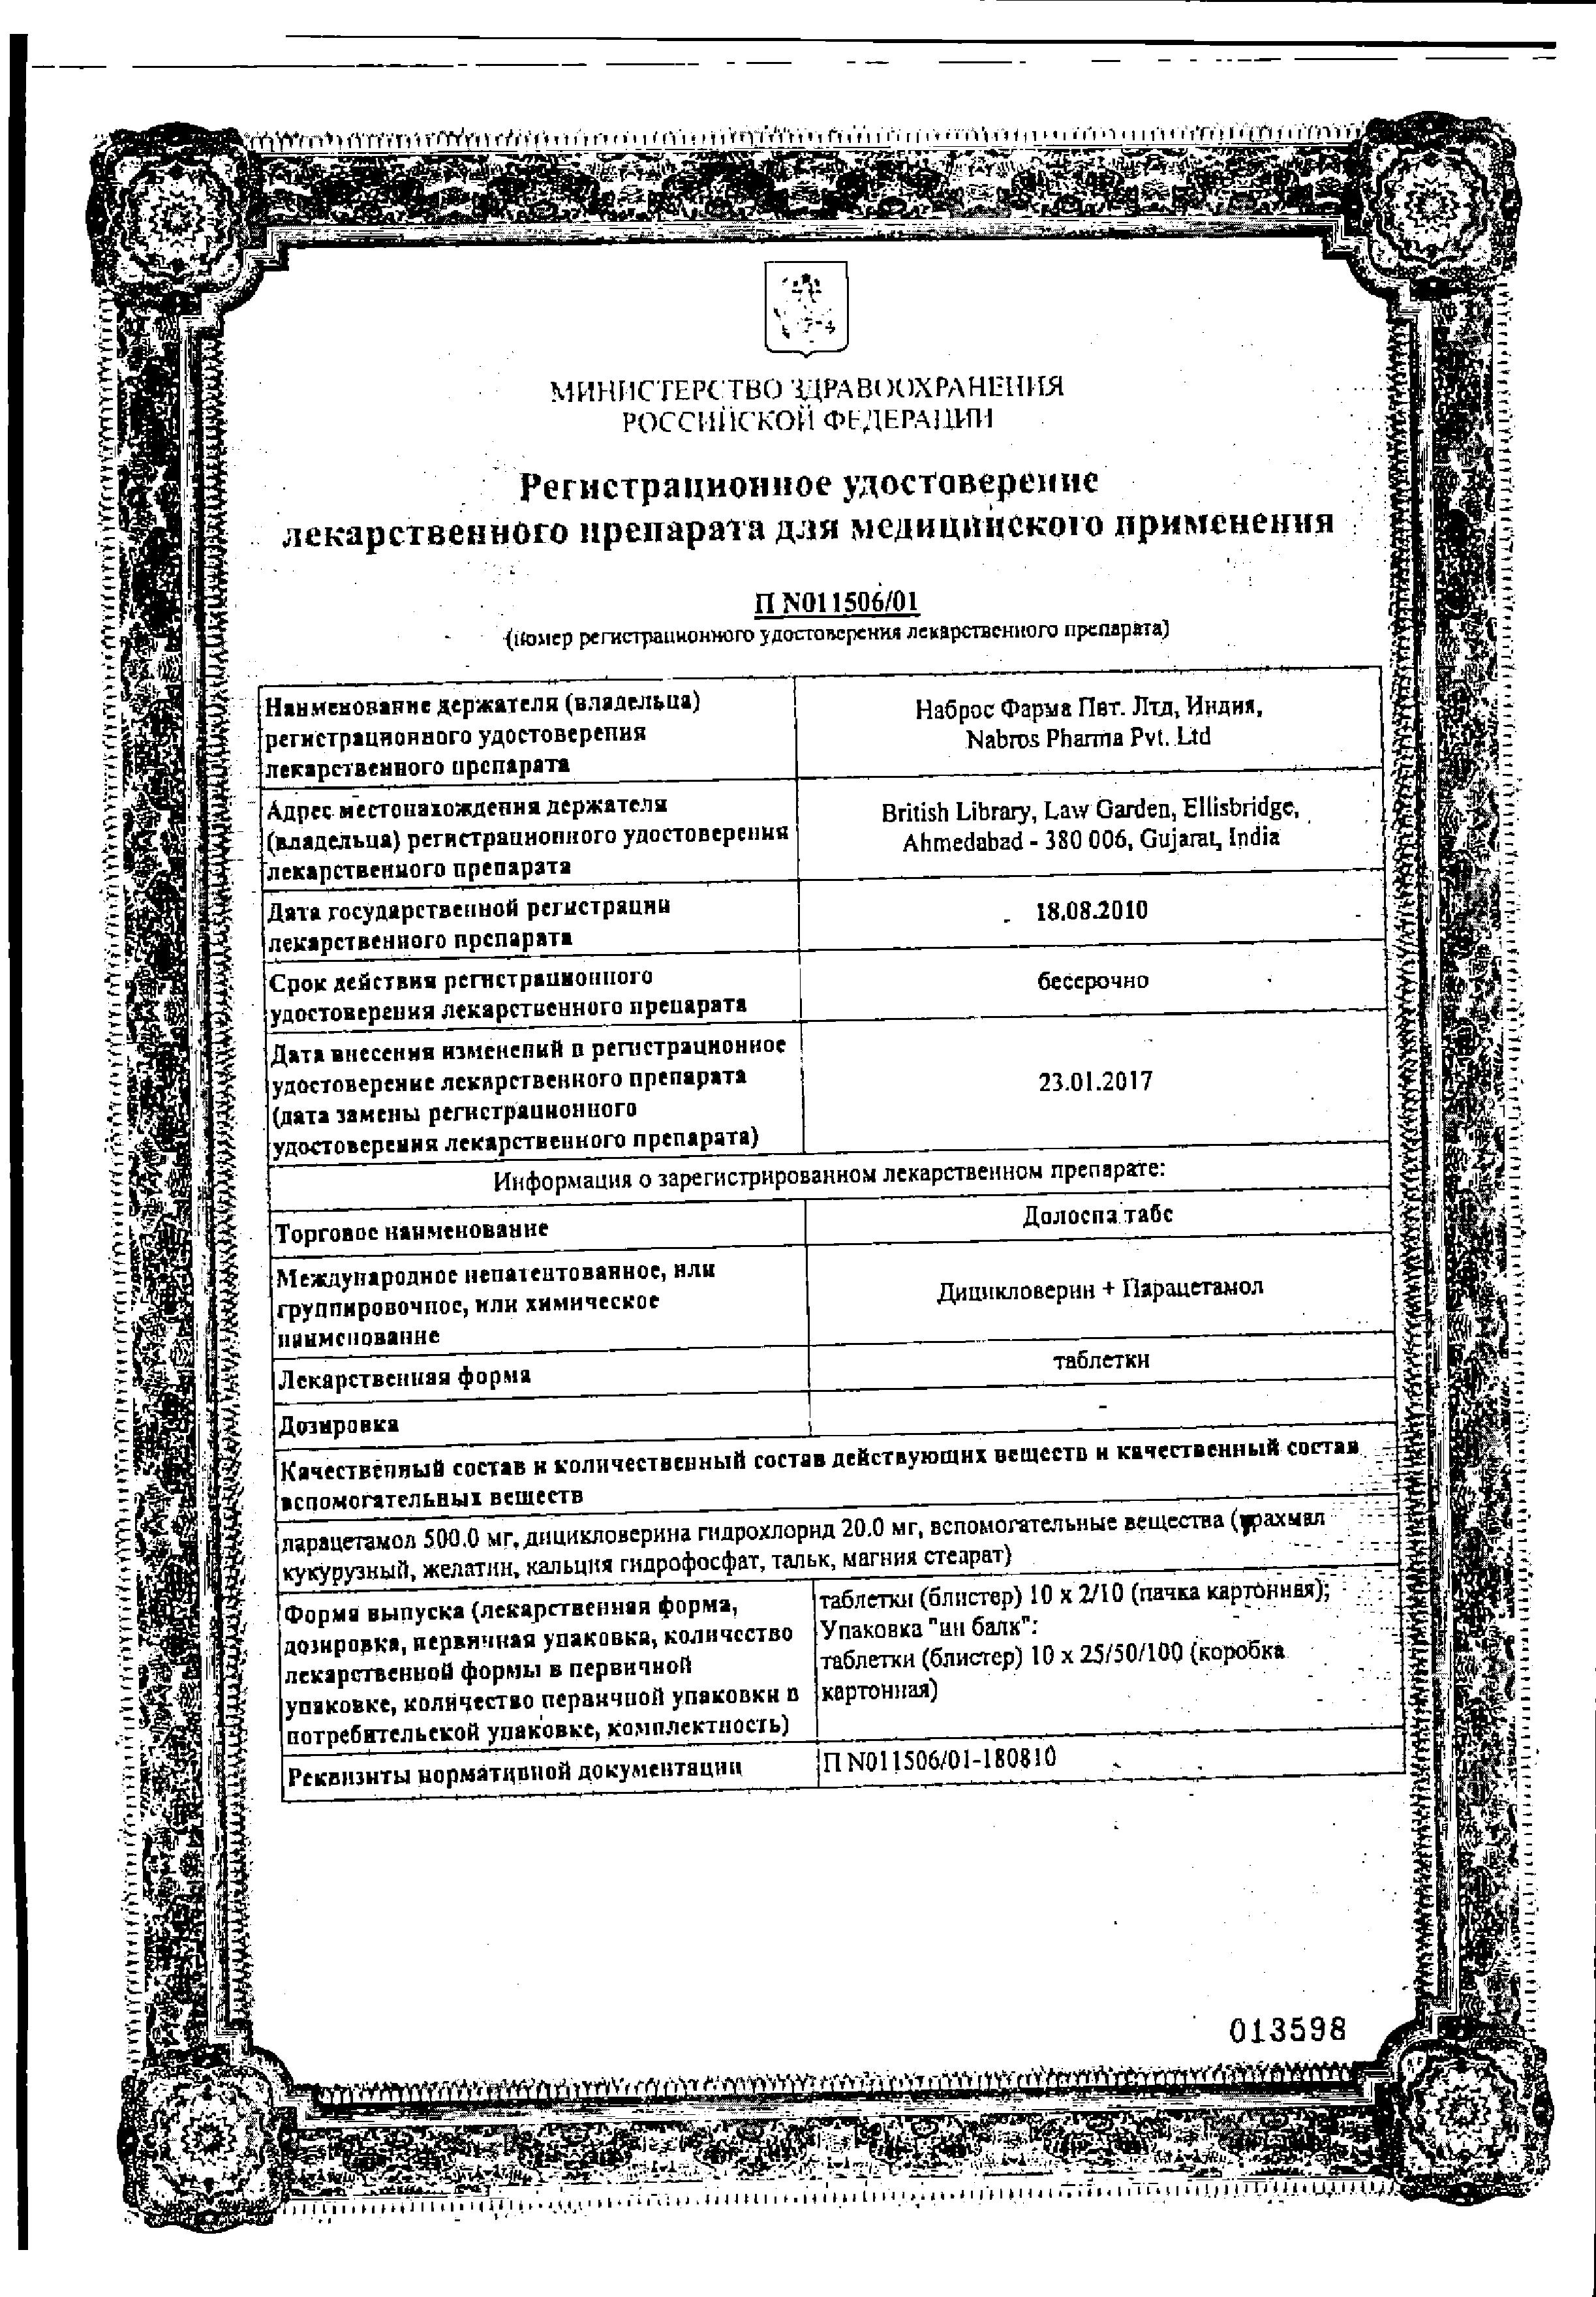 Долоспа табс сертификат